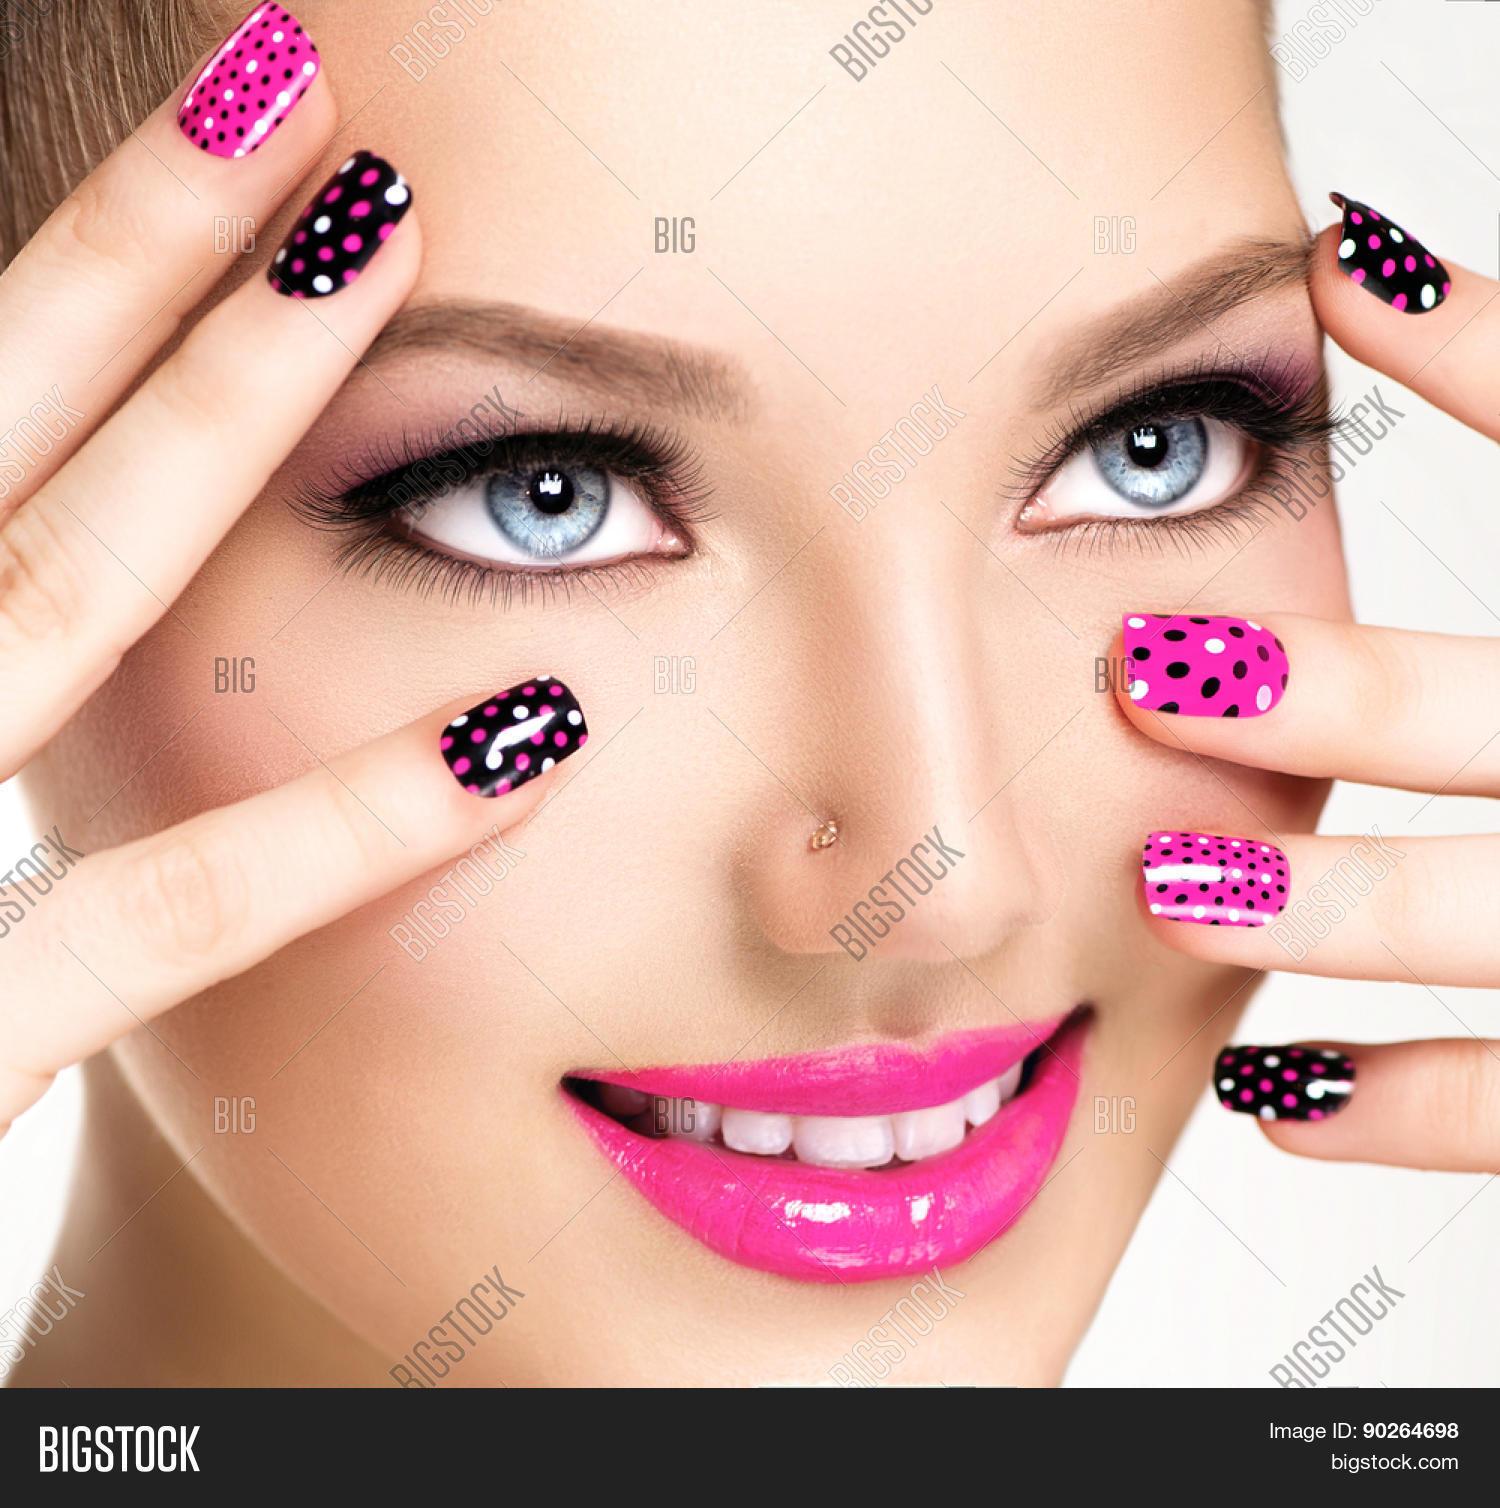 Nail Salon Game Beauty Makeover: Beauty Girl Portrait Vivid Makeup Image & Photo